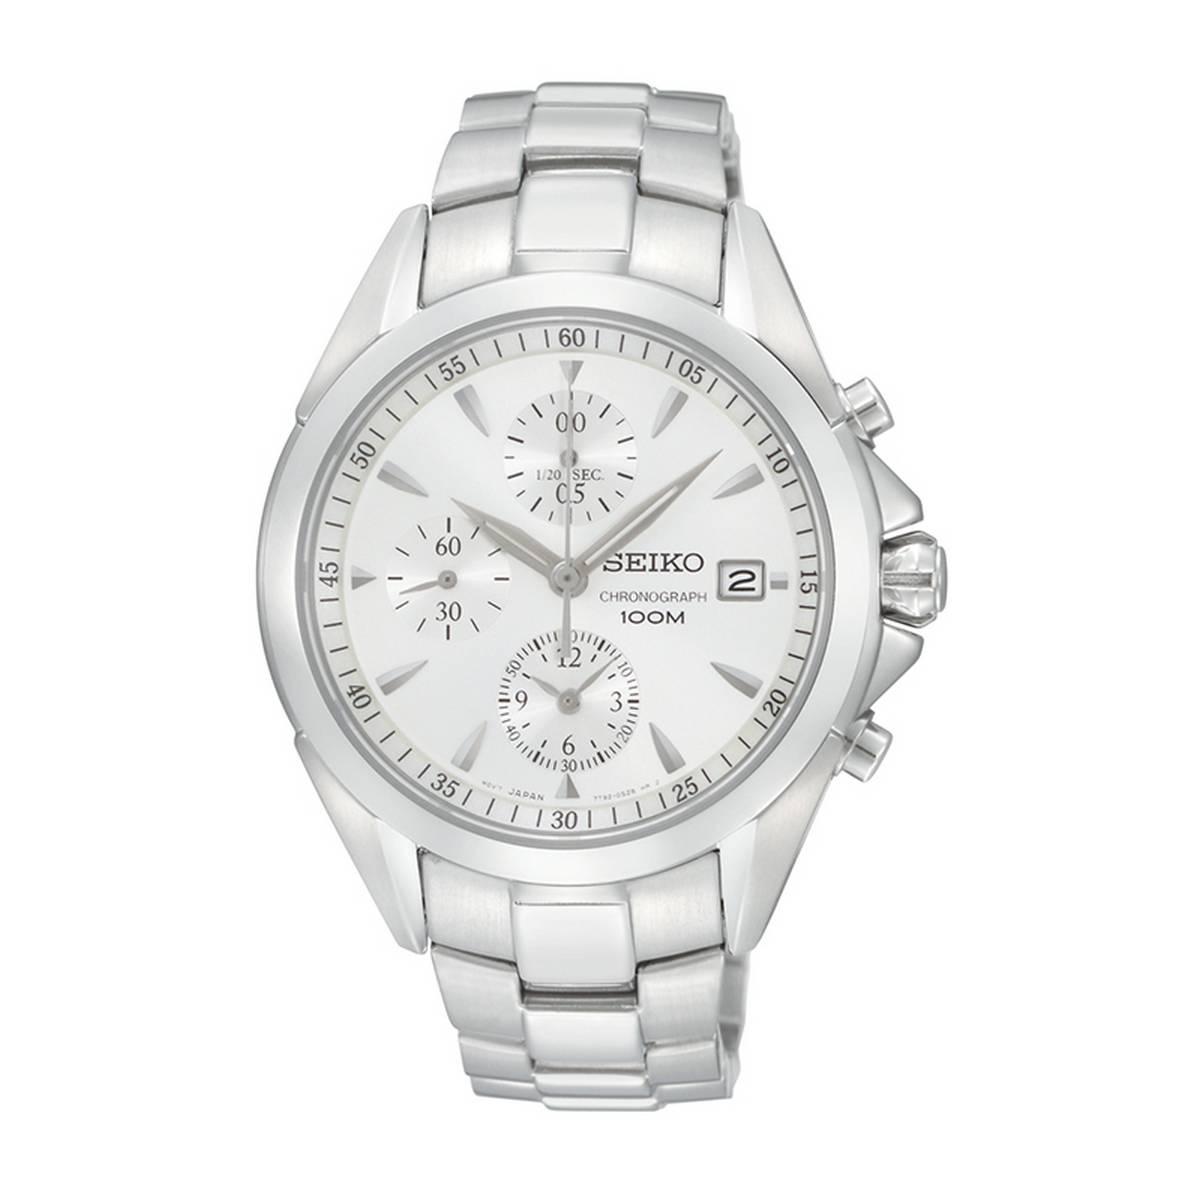 Seiko Chronograph Men's Quartz Watch SNDY29P1